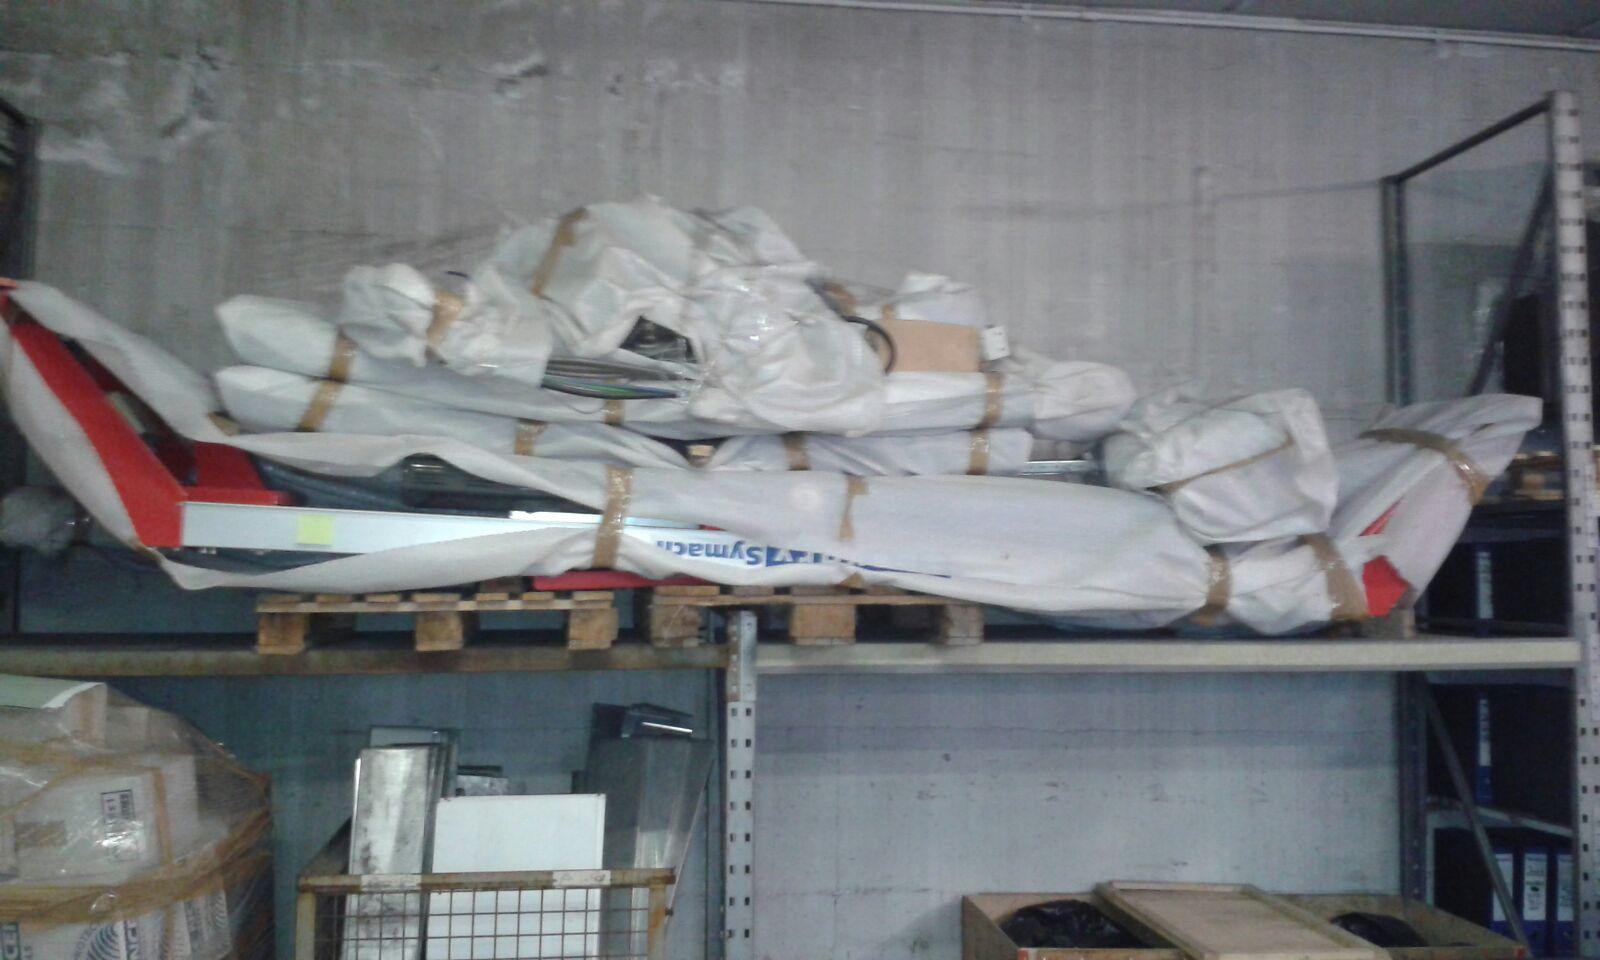 Arco per essicazione carrozzeria Symach